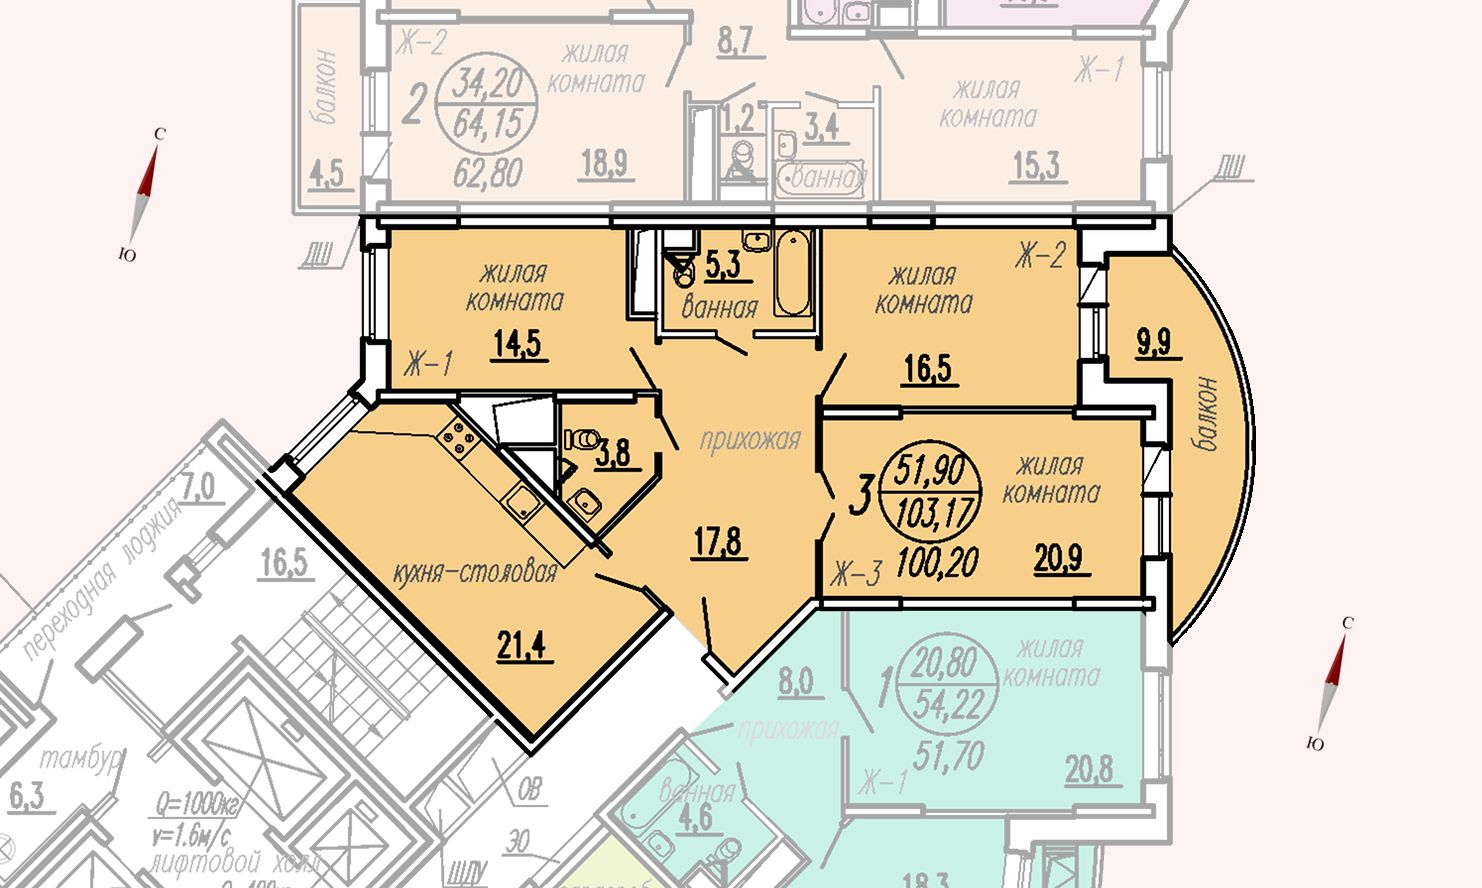 ул. Дирижабельная, д. 1, секция3, квартира 103,17 м2